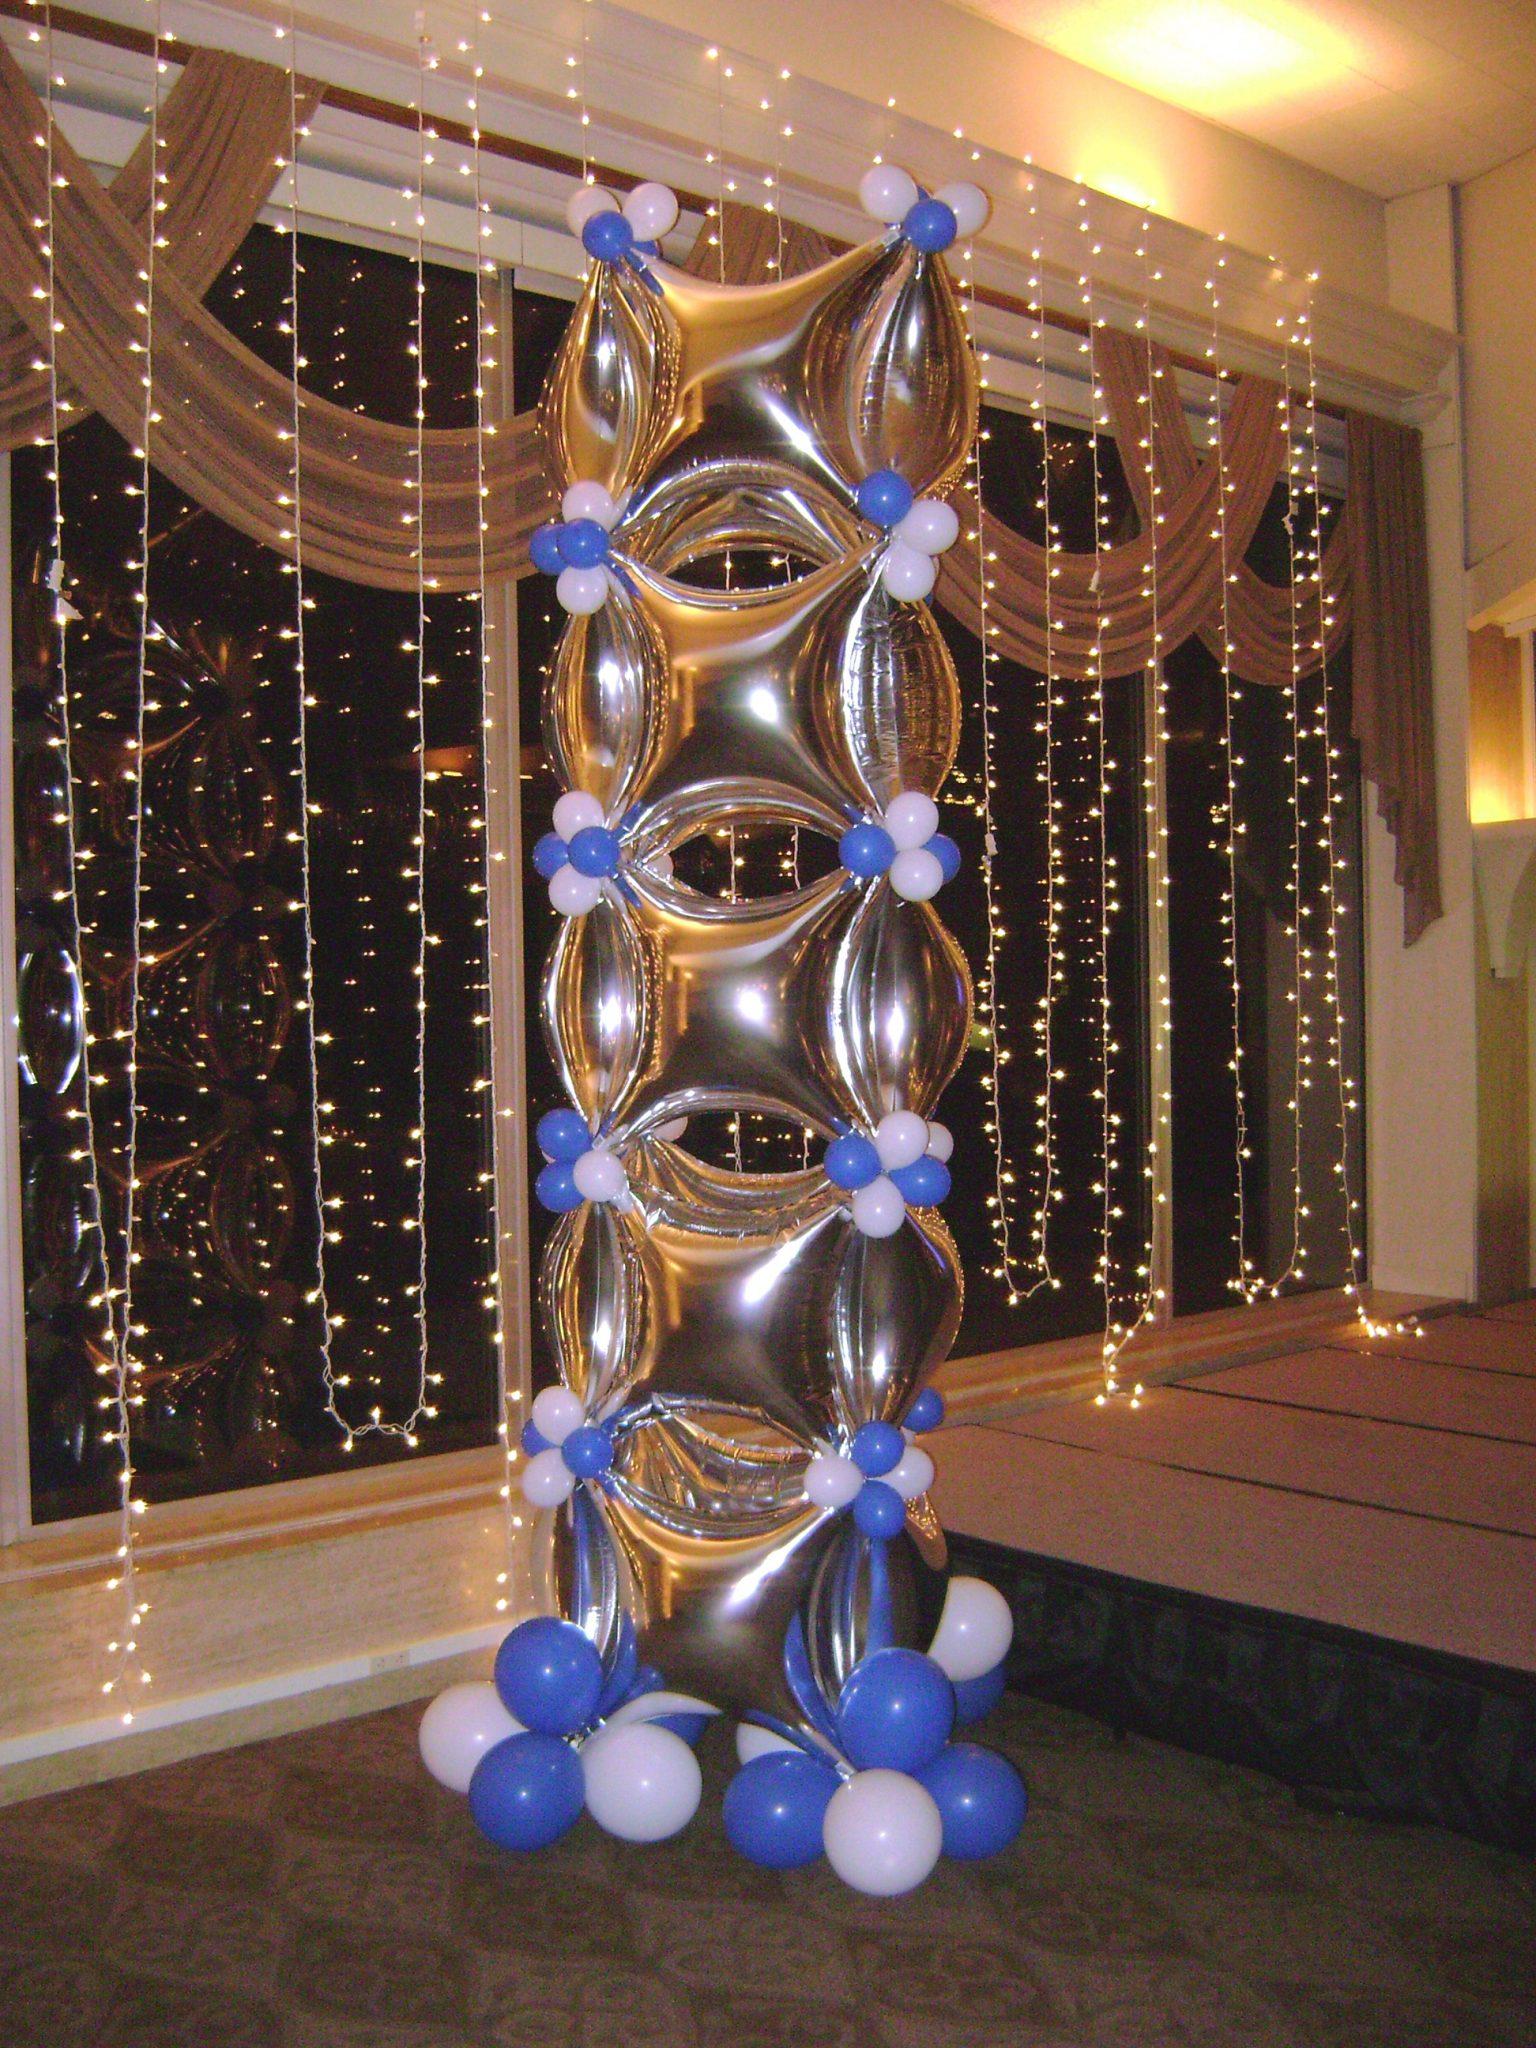 SAMMY J Balloon Creations st louis balloons foil star column